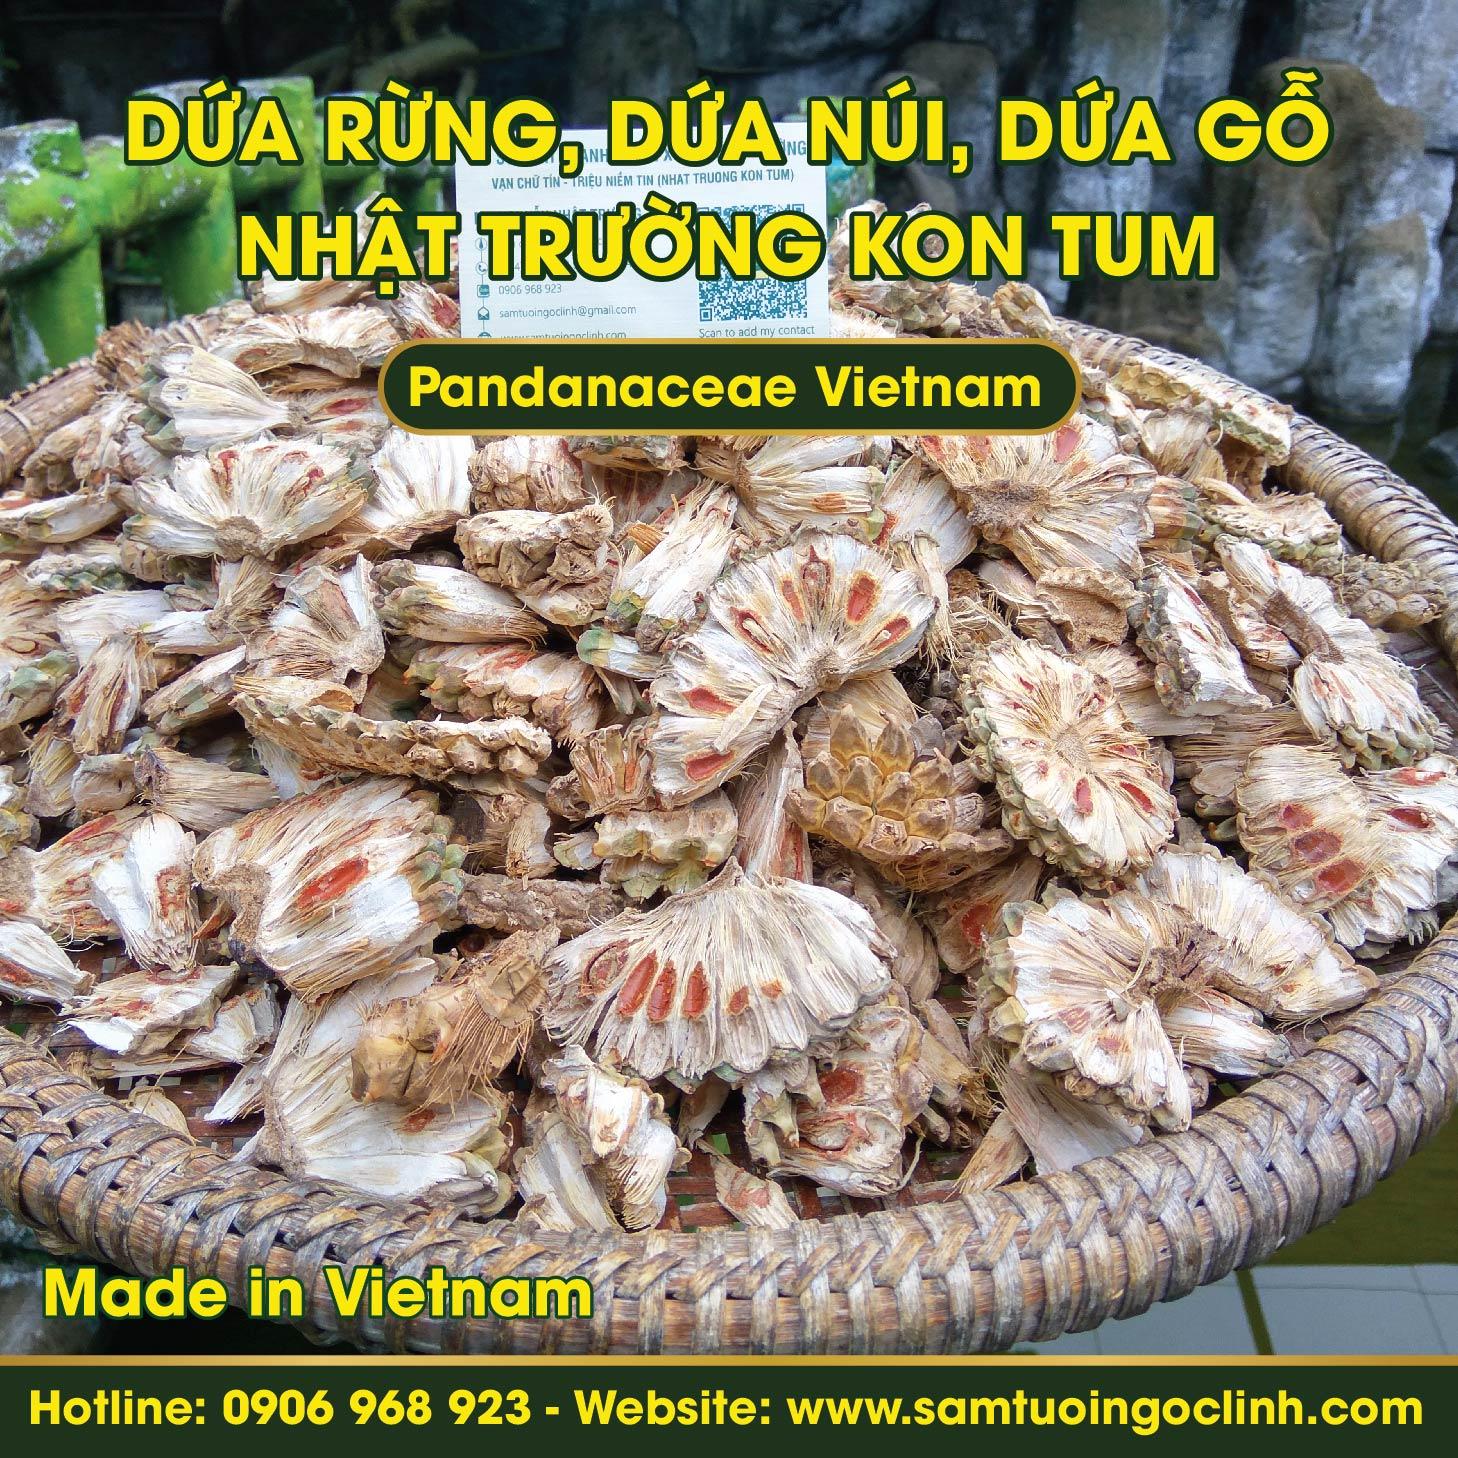 Dứa rừng, Dứa núi, Dứa gỗ Kon Tum Việt Nam - Pandanaceae Vietnam